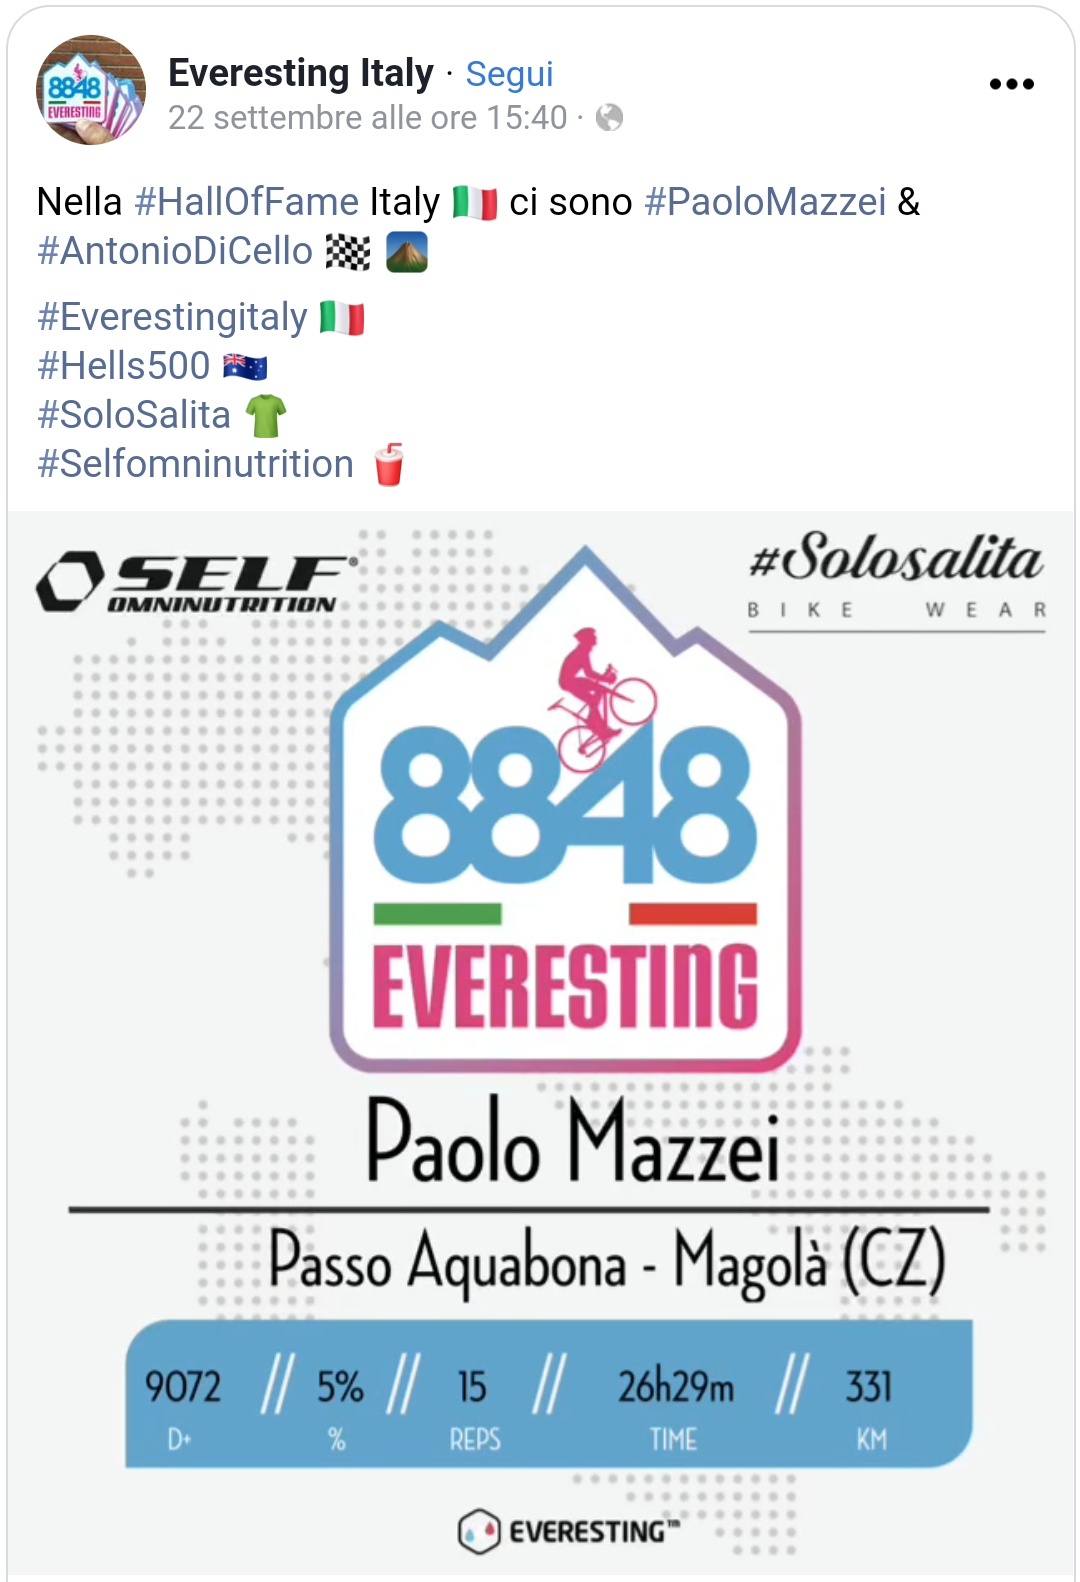 Everesting Italia